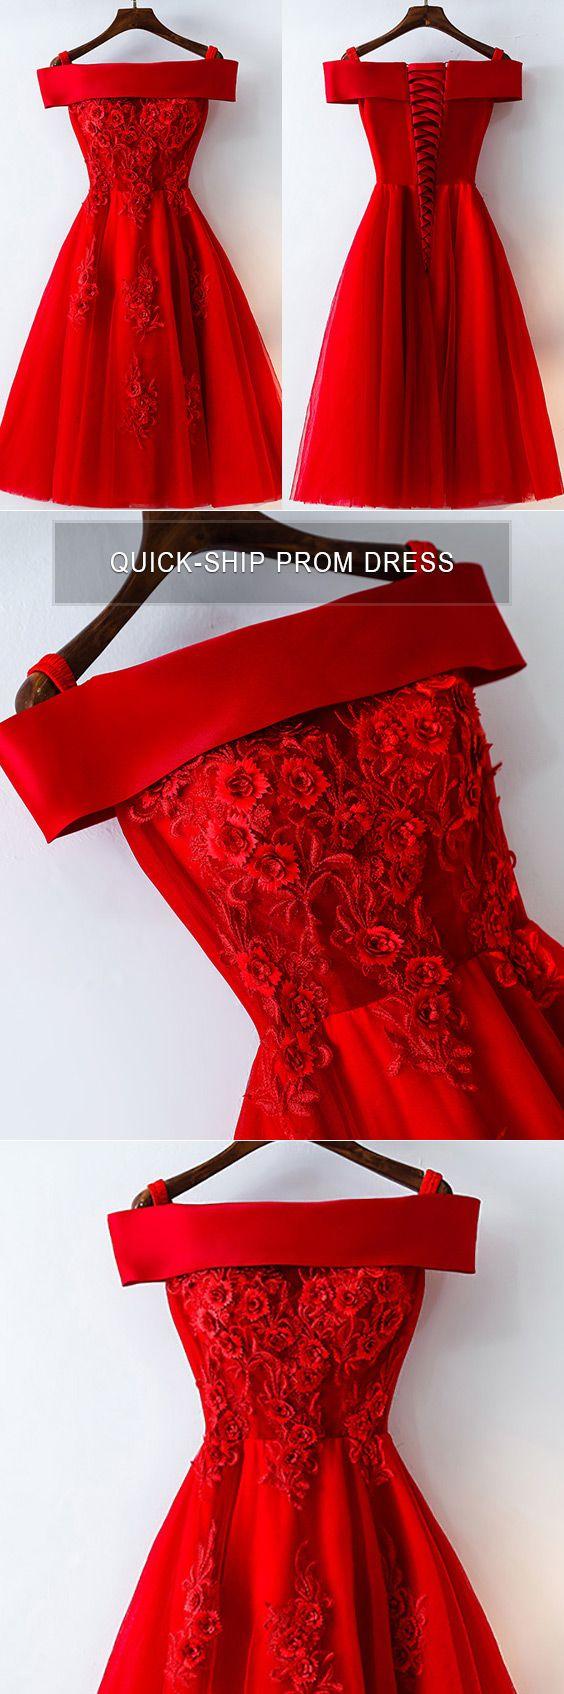 Short off shoulder red lace bridal party dress myx gemgrace